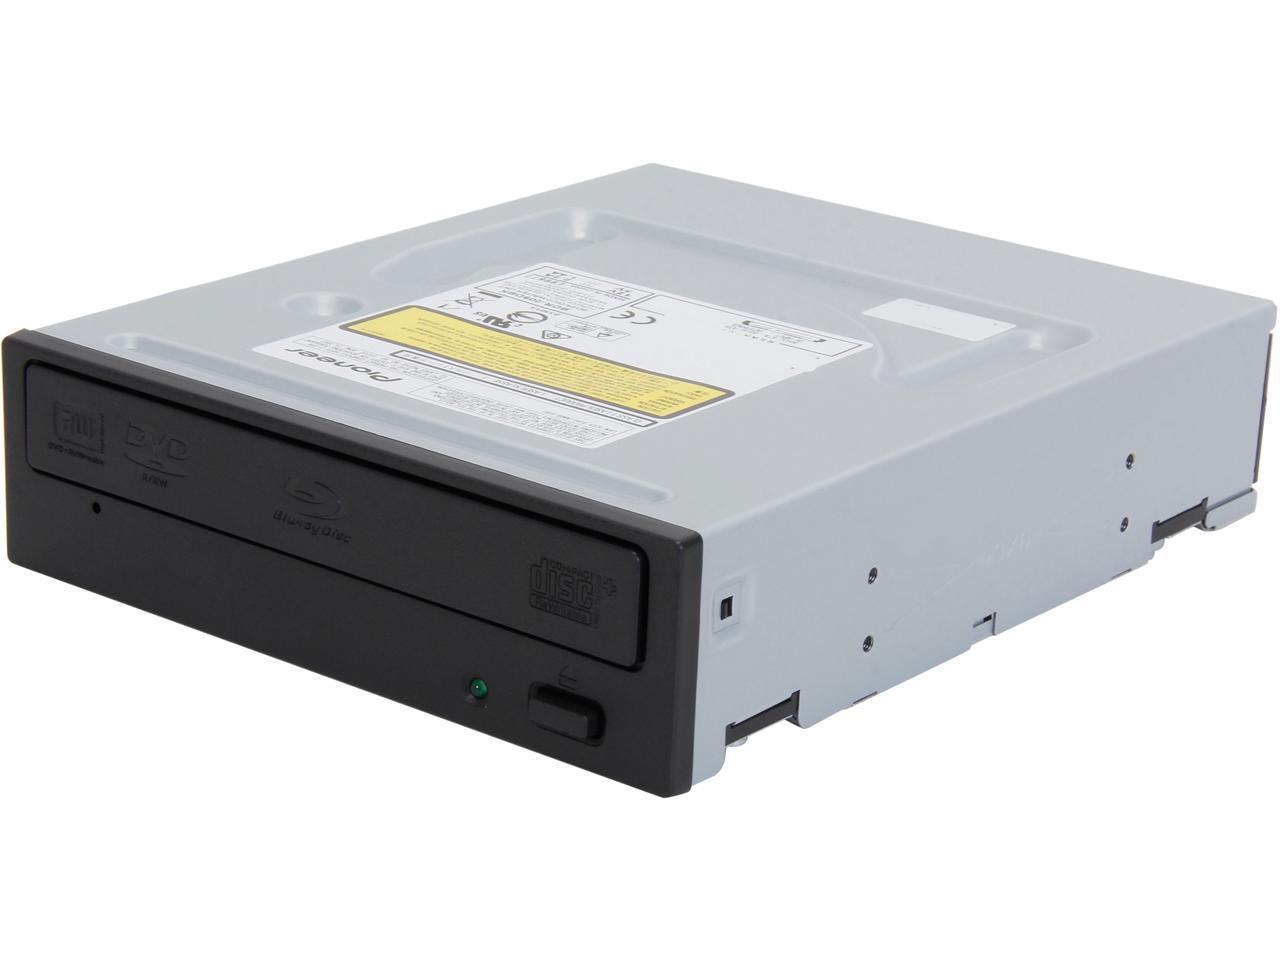 BDR-209DBK Pioneer Electronics USA Internal Blu-Ray Writer